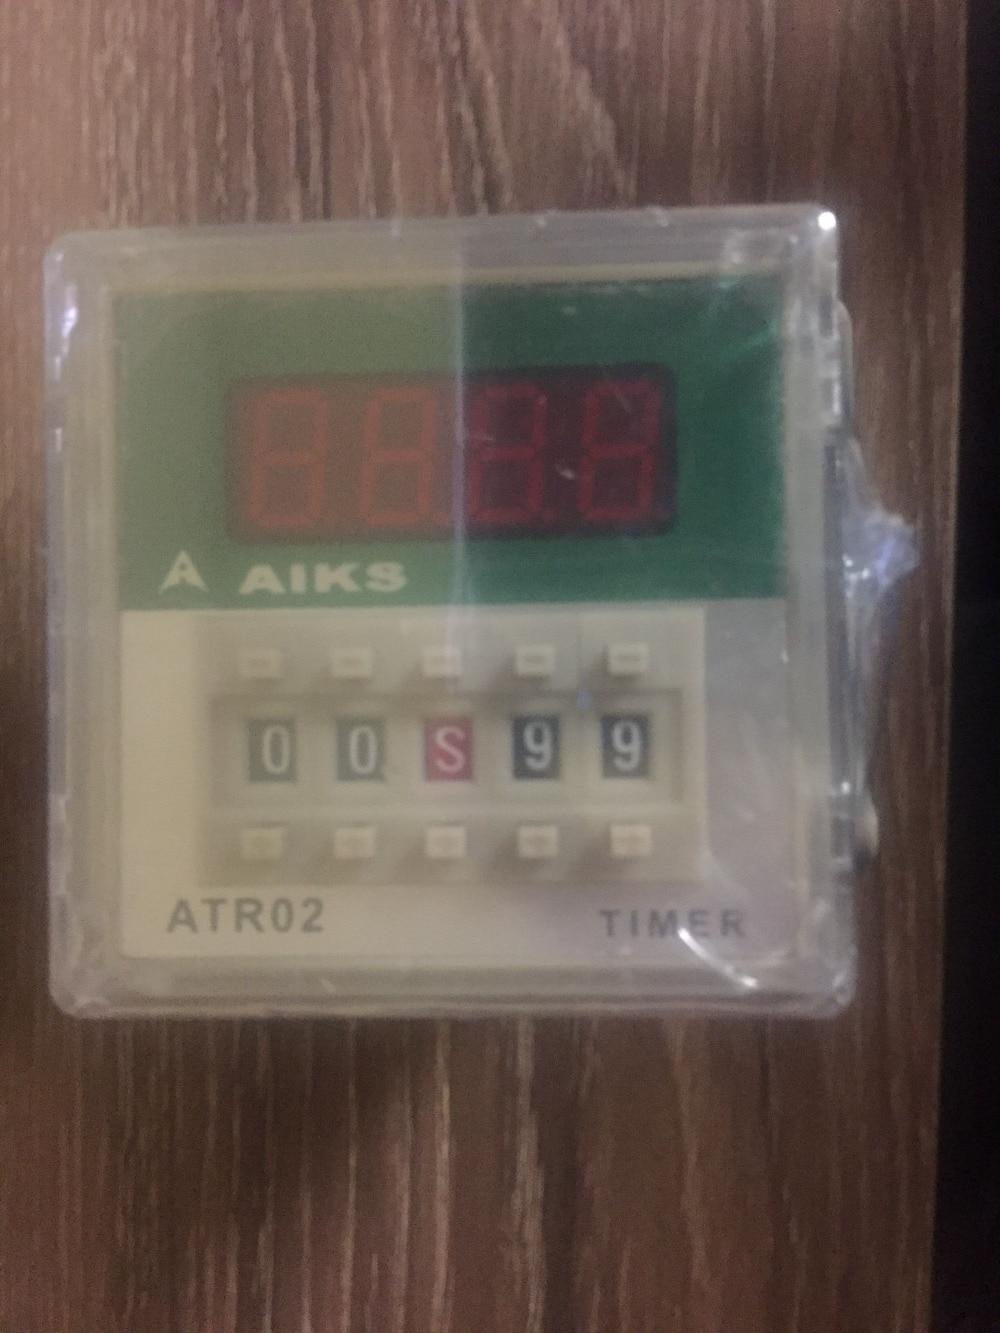 AIKS AUX time relay ATR02-B2 AC220V perfect alternative DH48S<br>